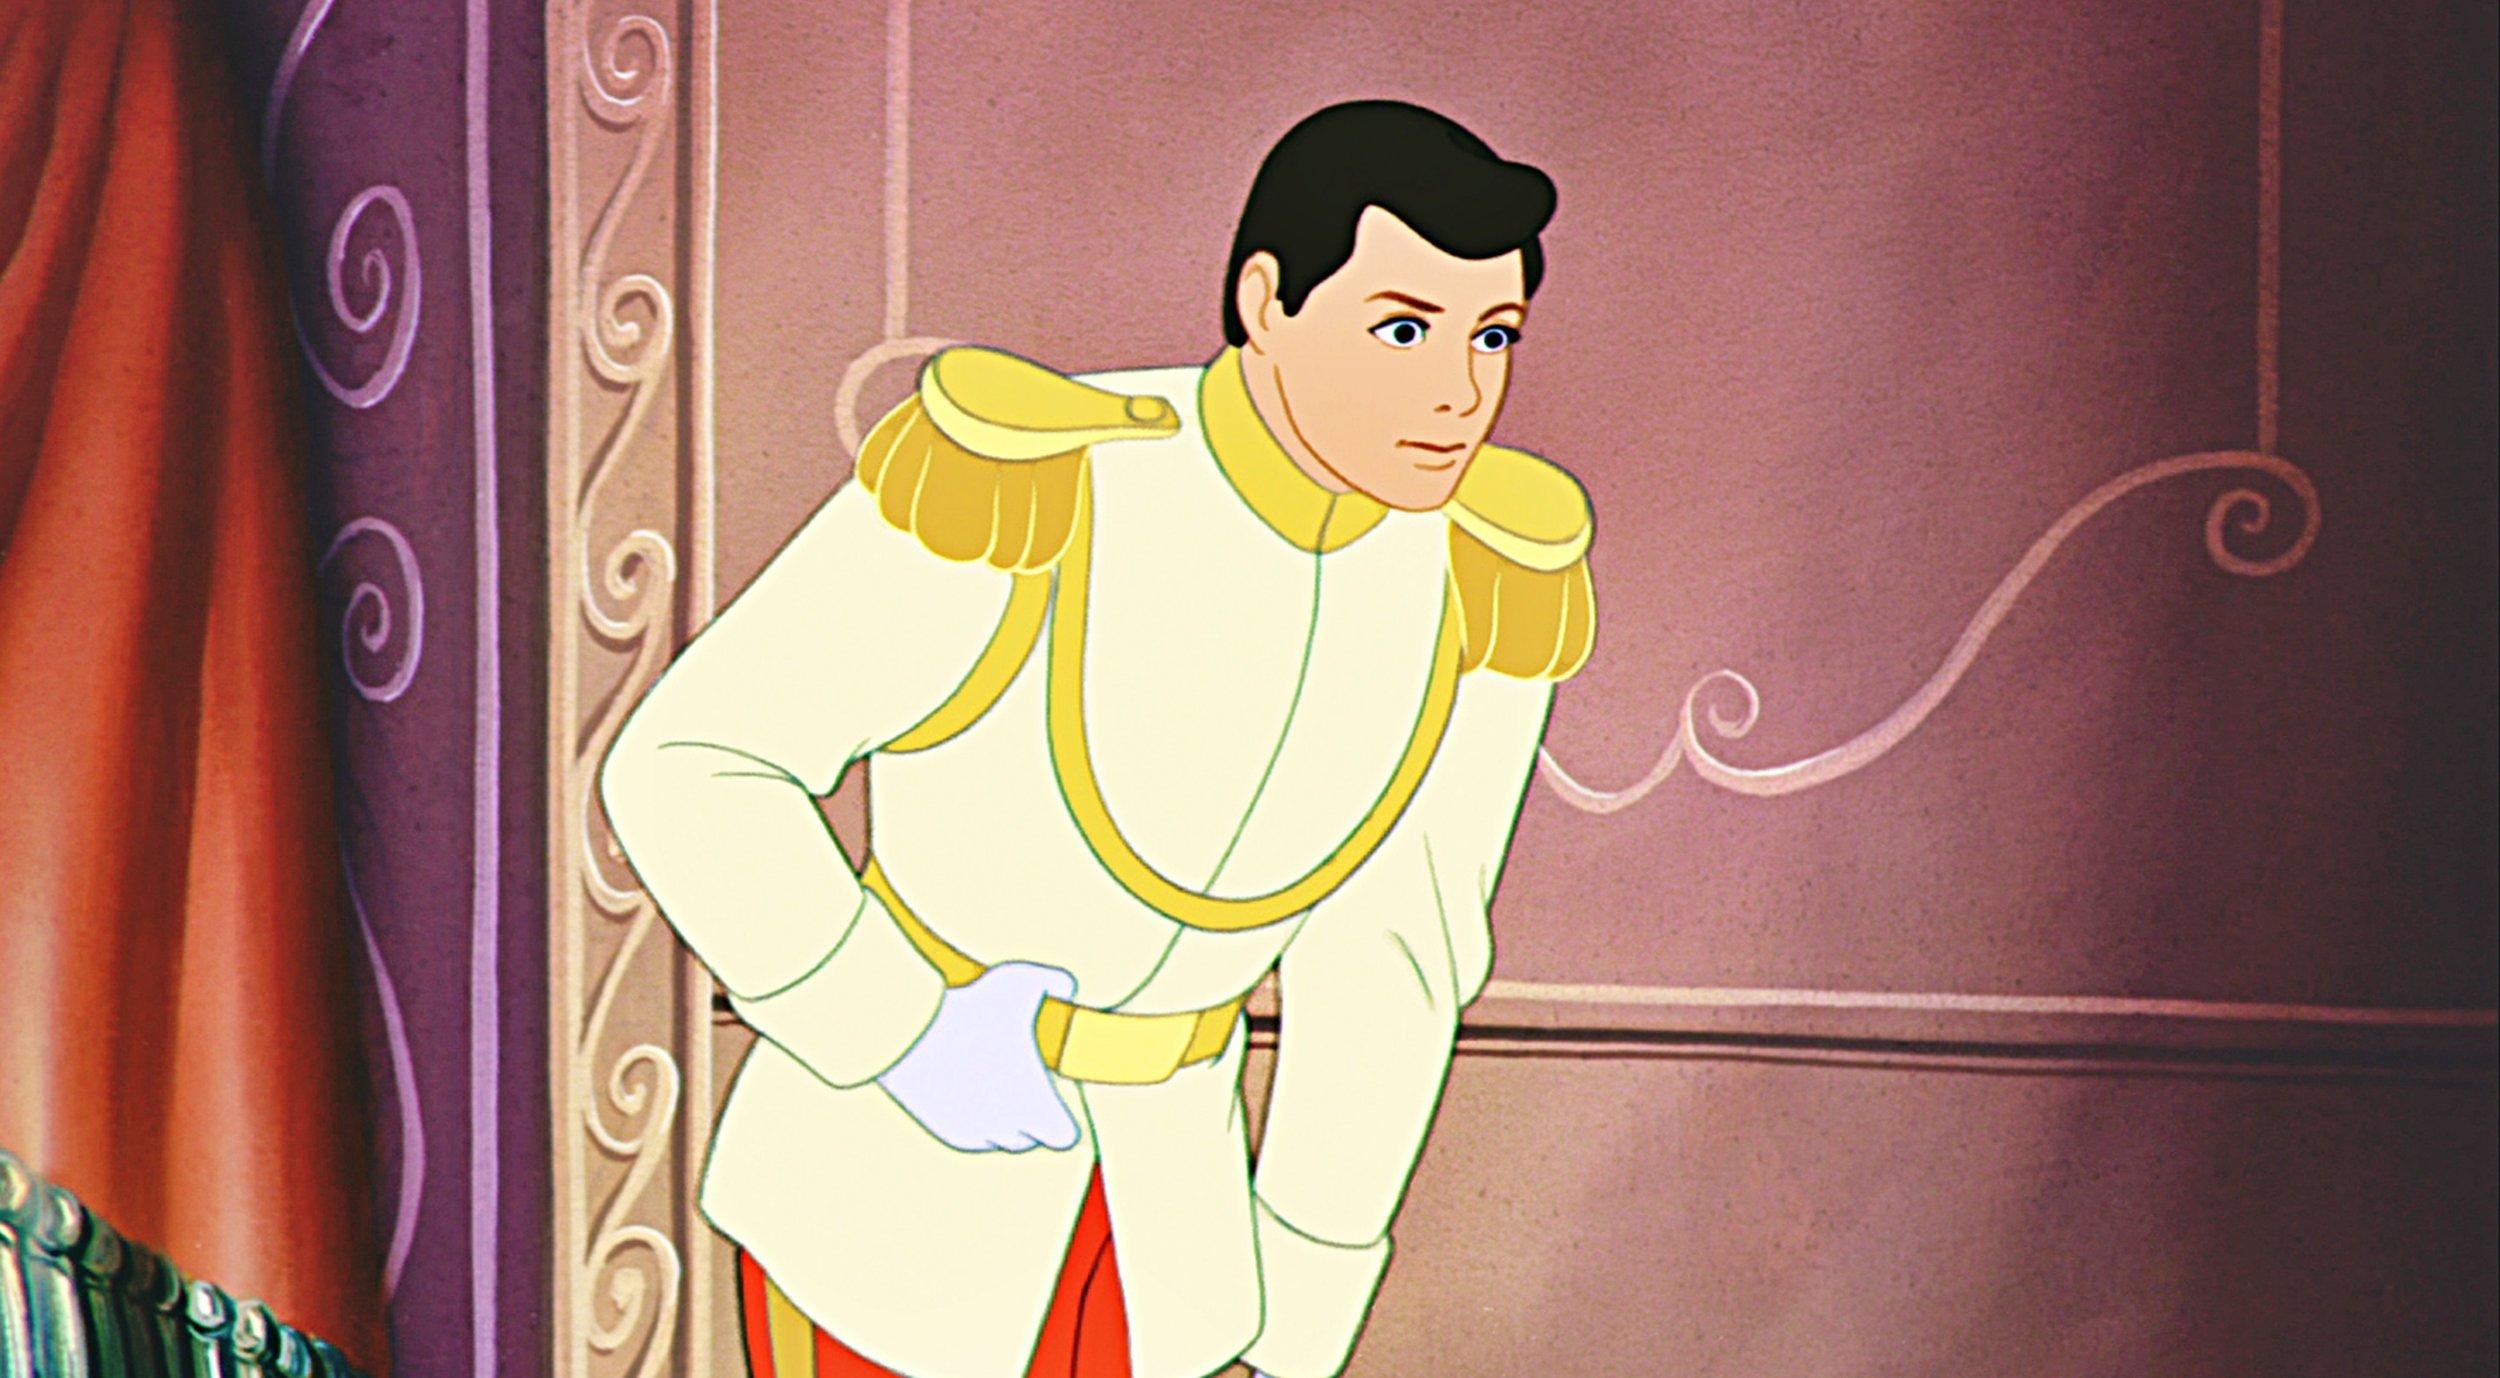 prince charming the movie